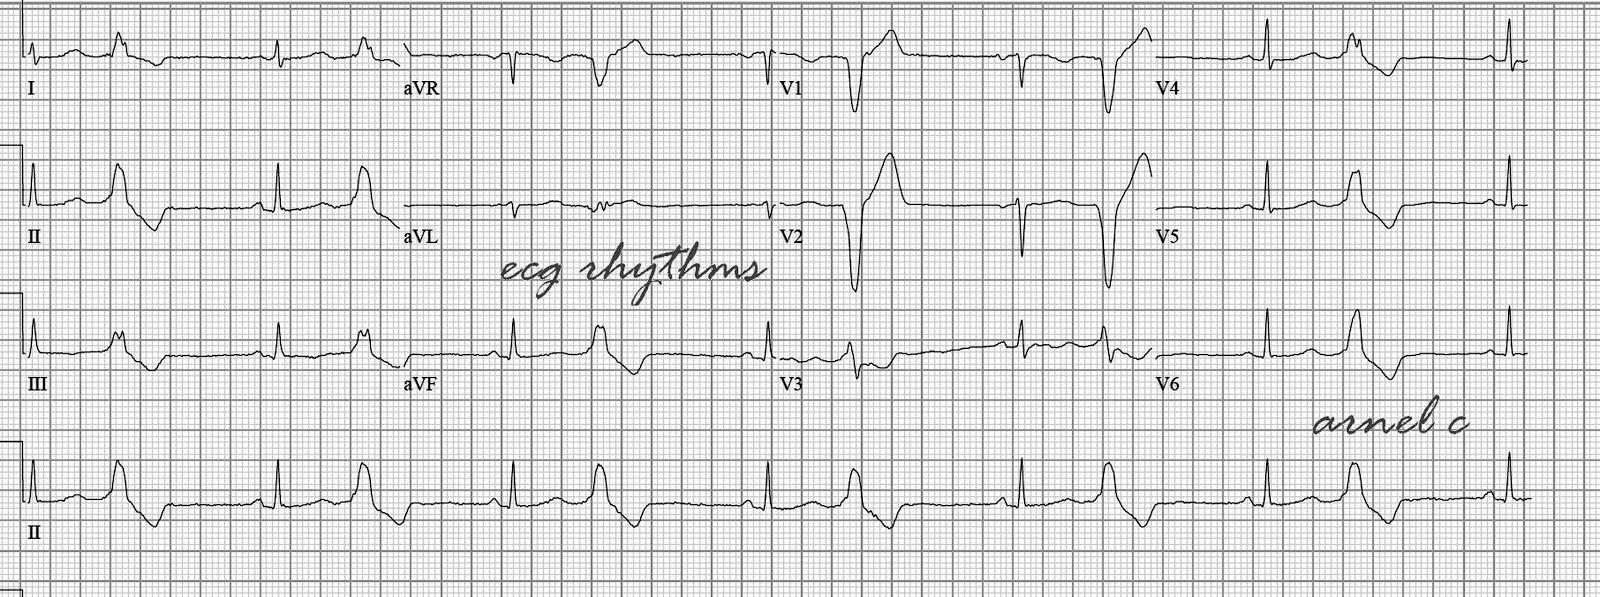 ECG Rhythms: Right Ventricular Outflow Tract Ventricular